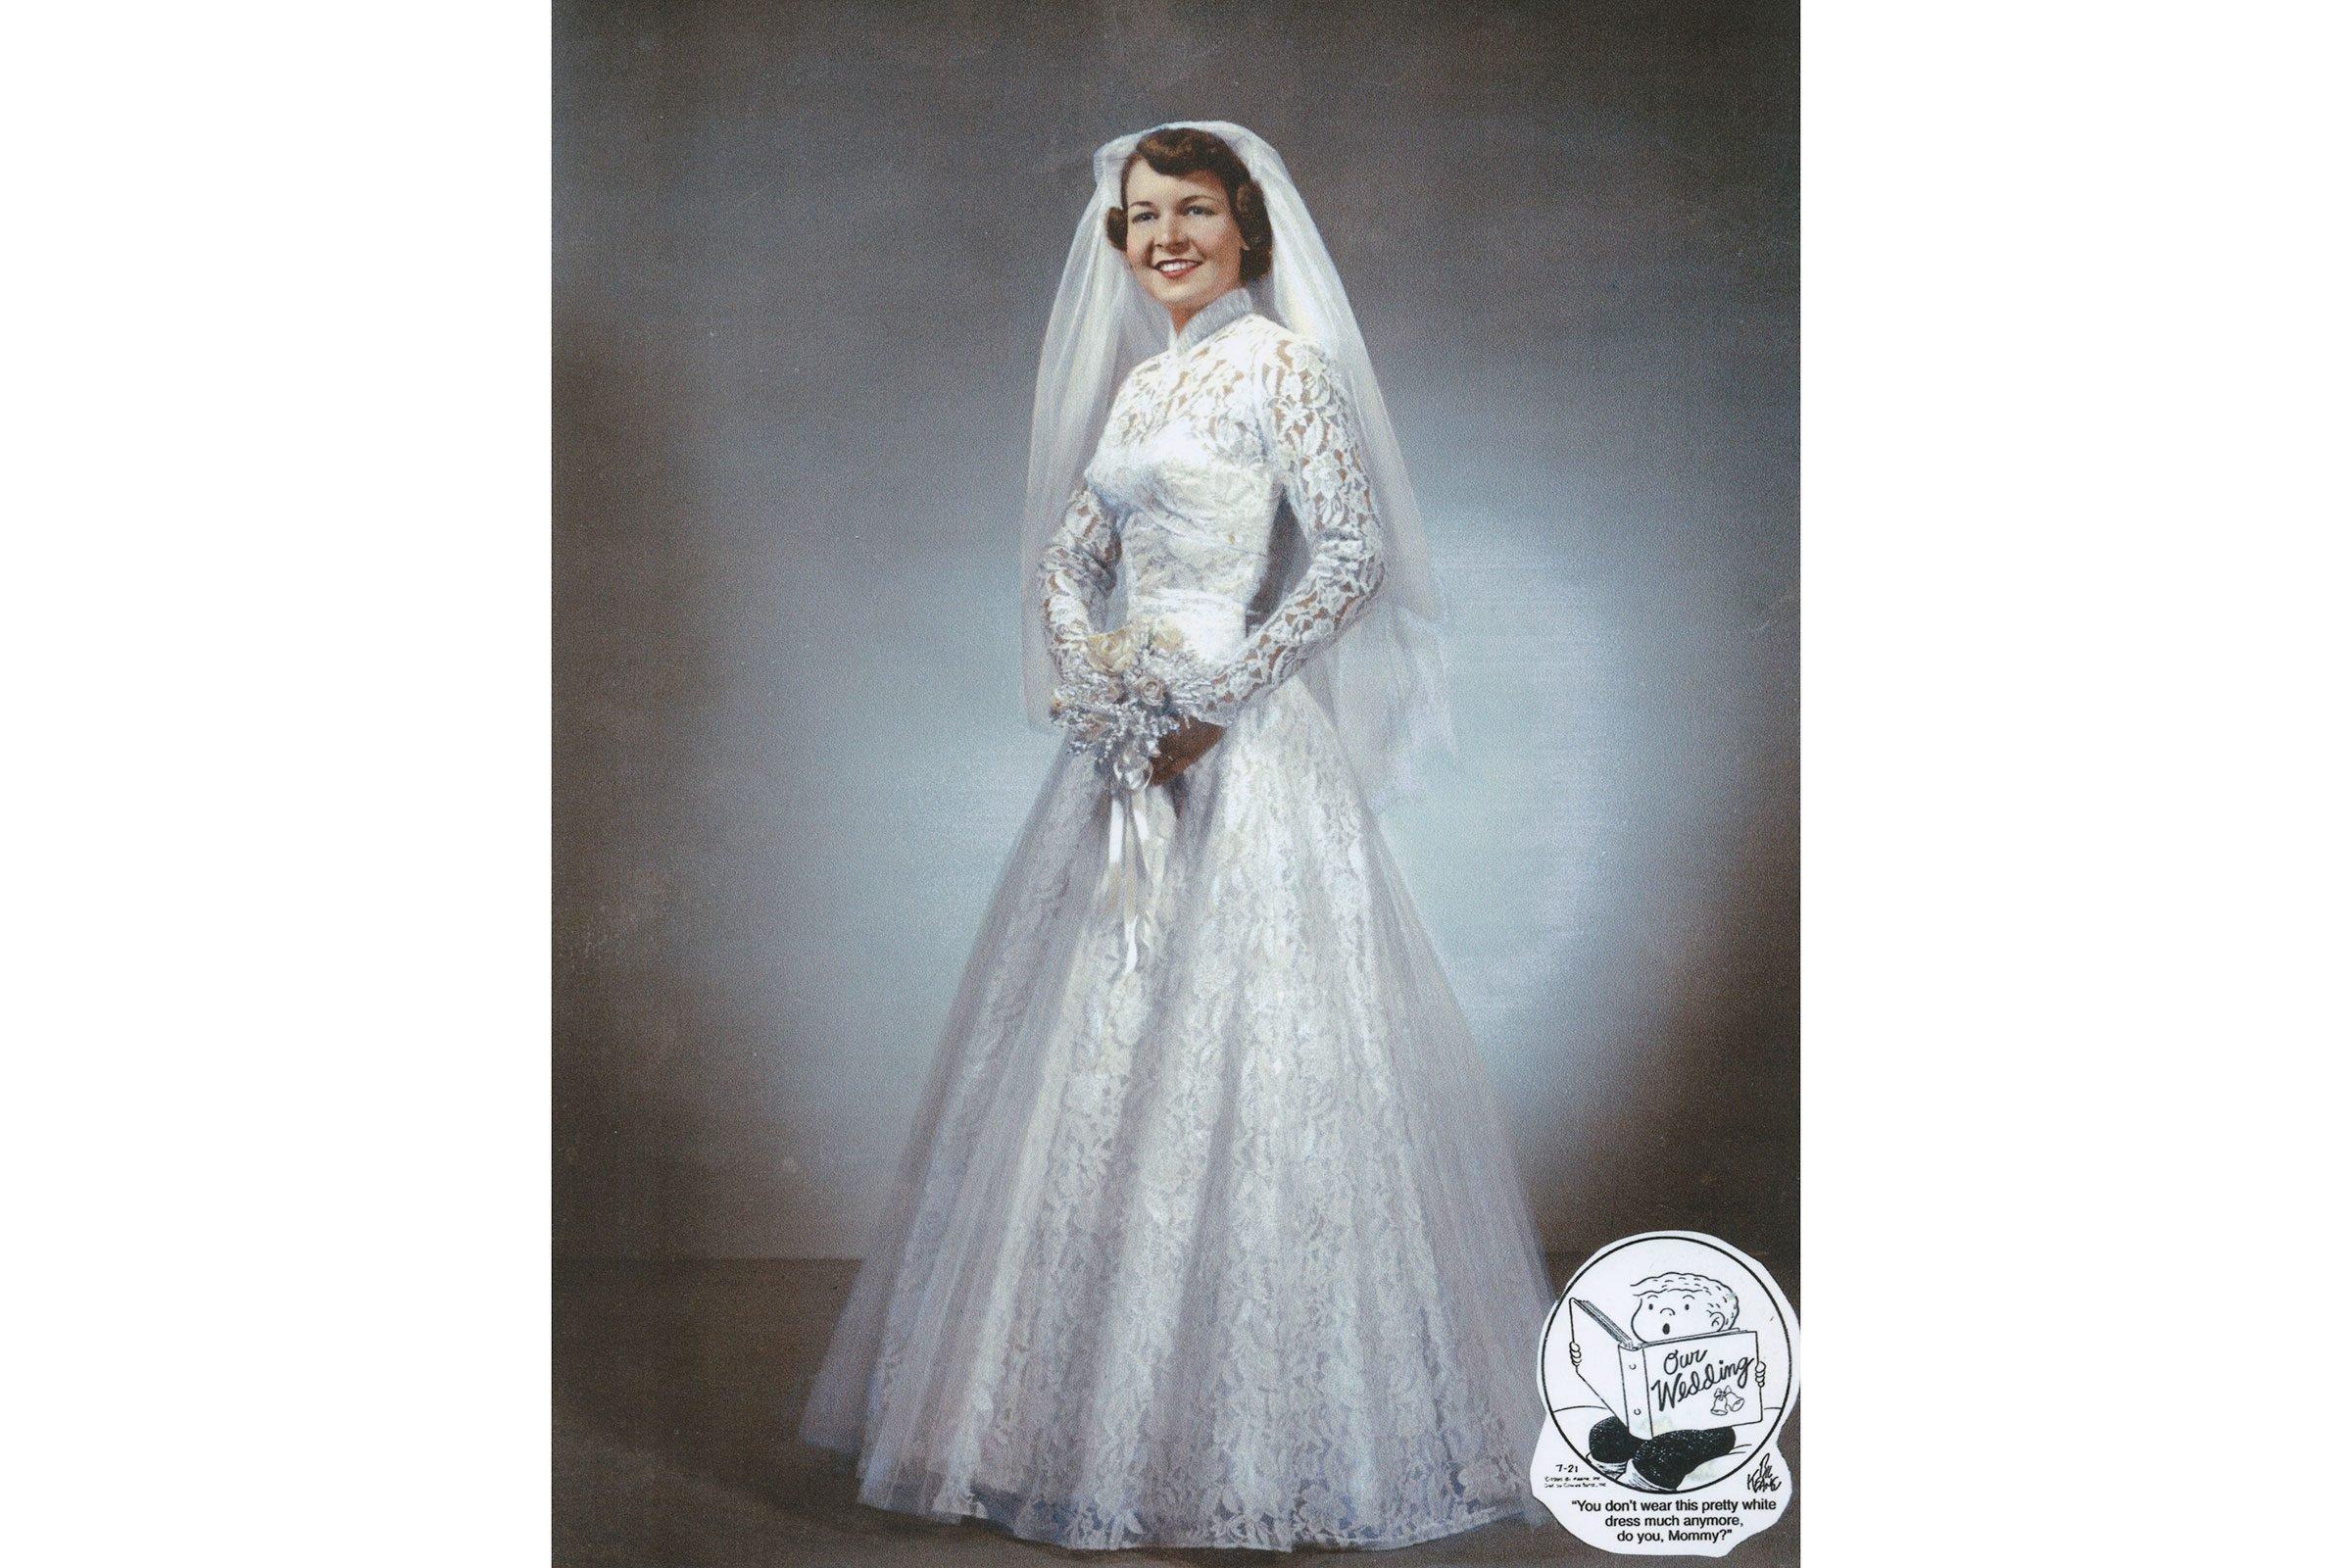 Dorable Bra For Wedding Dress Mold - All Wedding Dresses ...